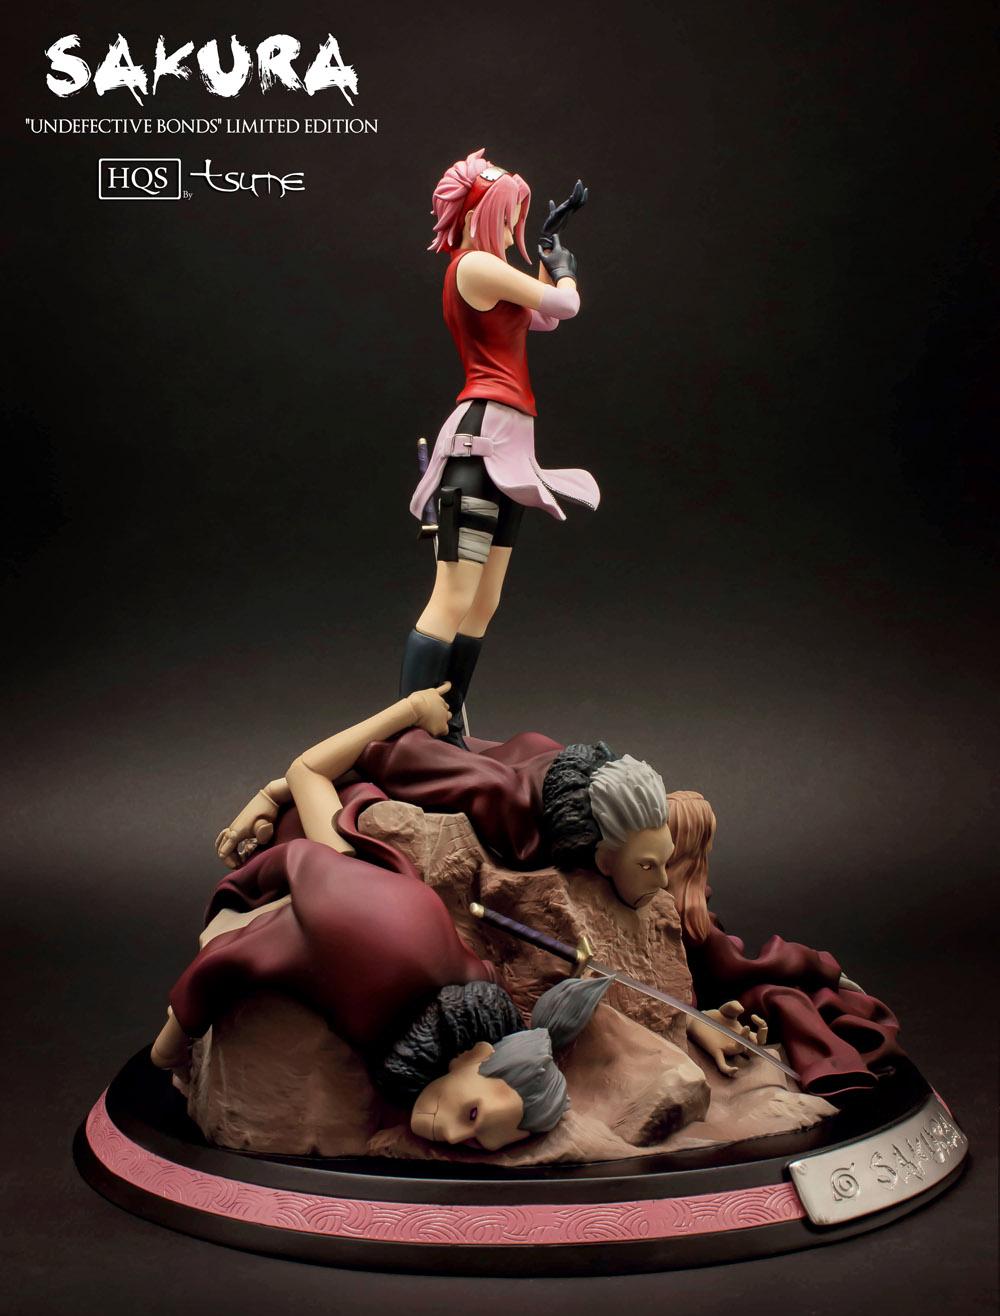 Sakura Haruno Figure Sakura Haruno Undefective